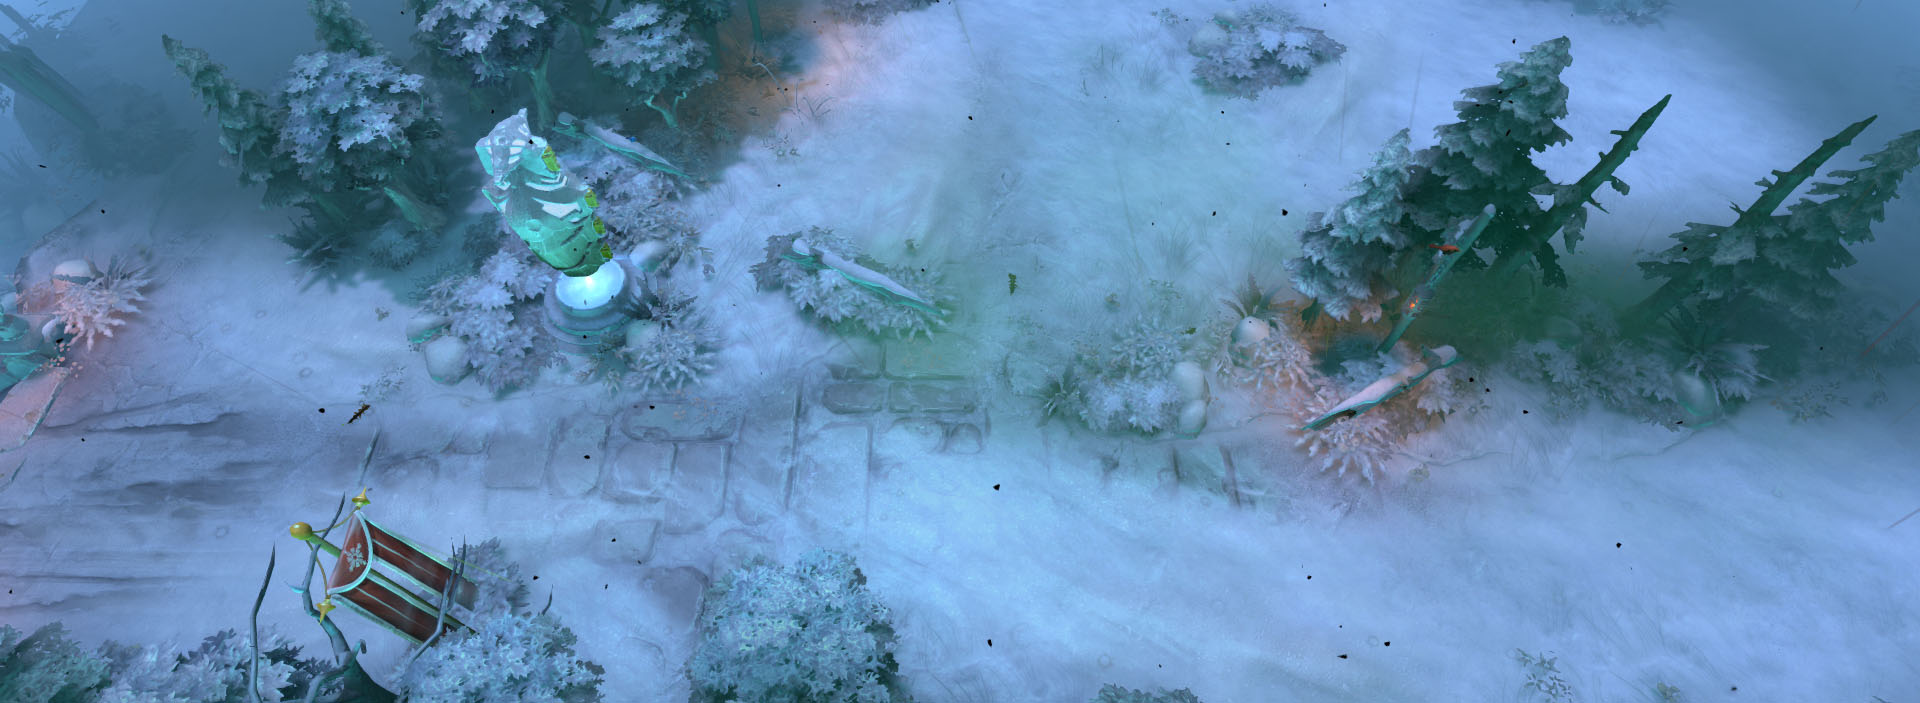 Winter Terrain Weather Pestilence Preview 2.jpg